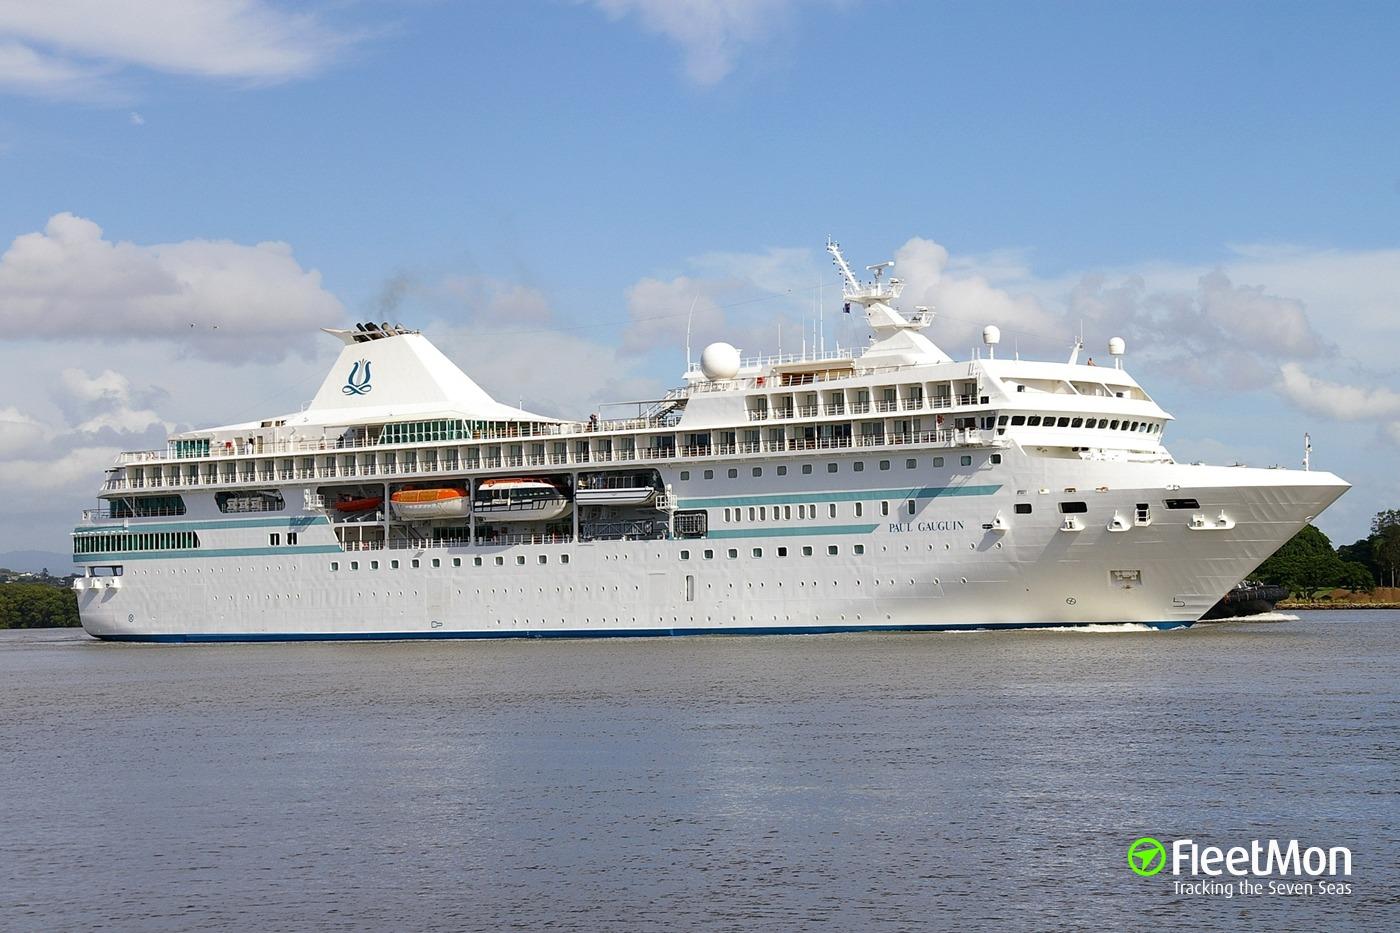 Cruise ship PAUL GAUGUIN was stuck in Bora Bora